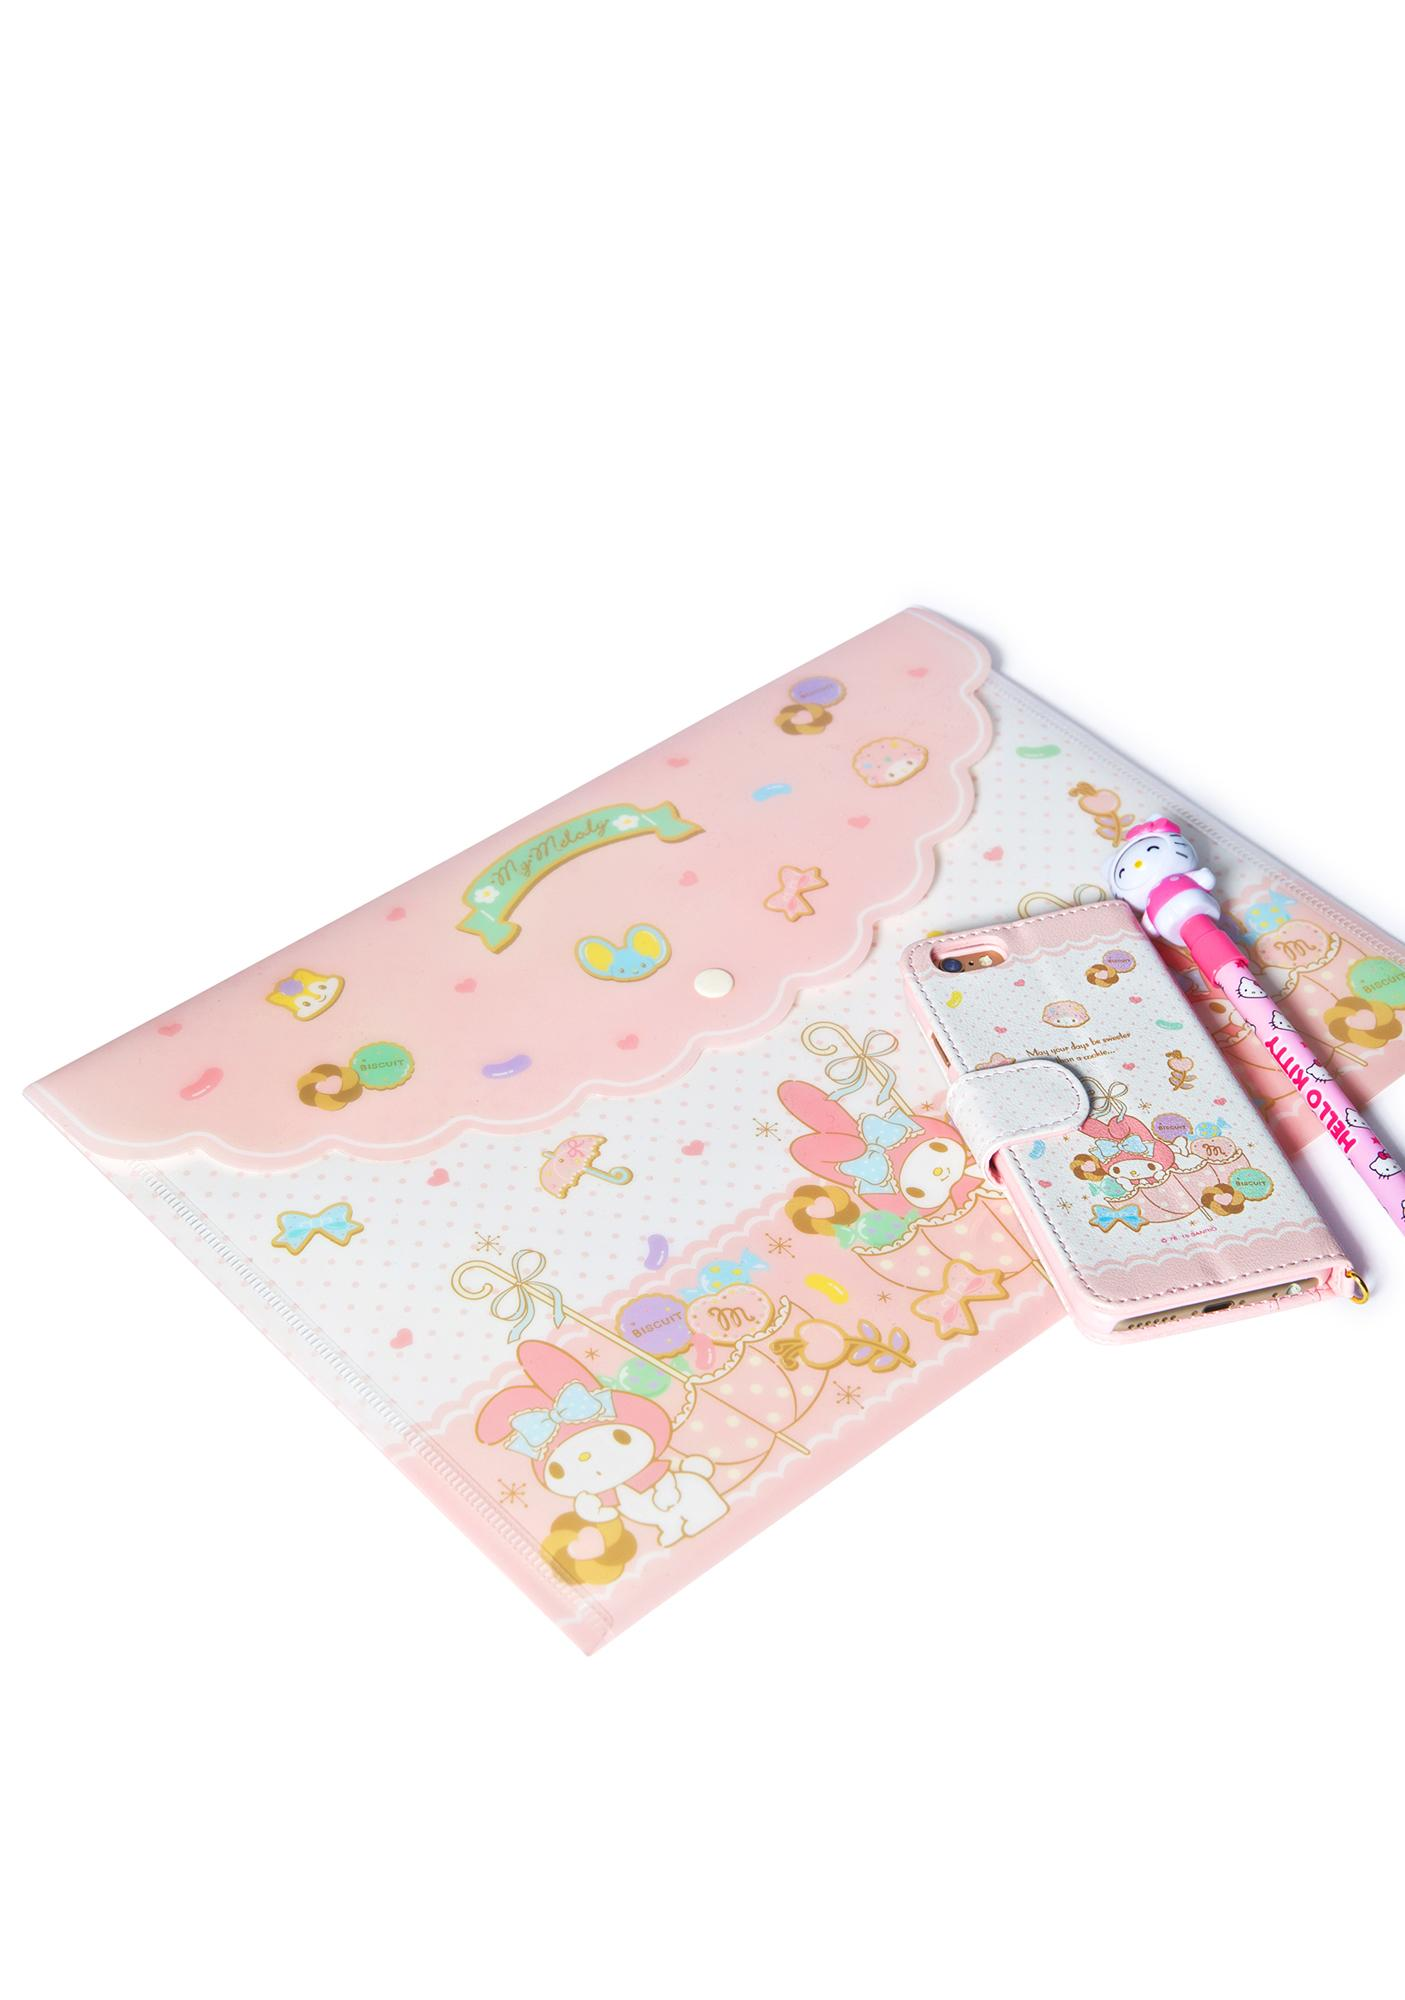 Sanrio My Melody Snap Envelope